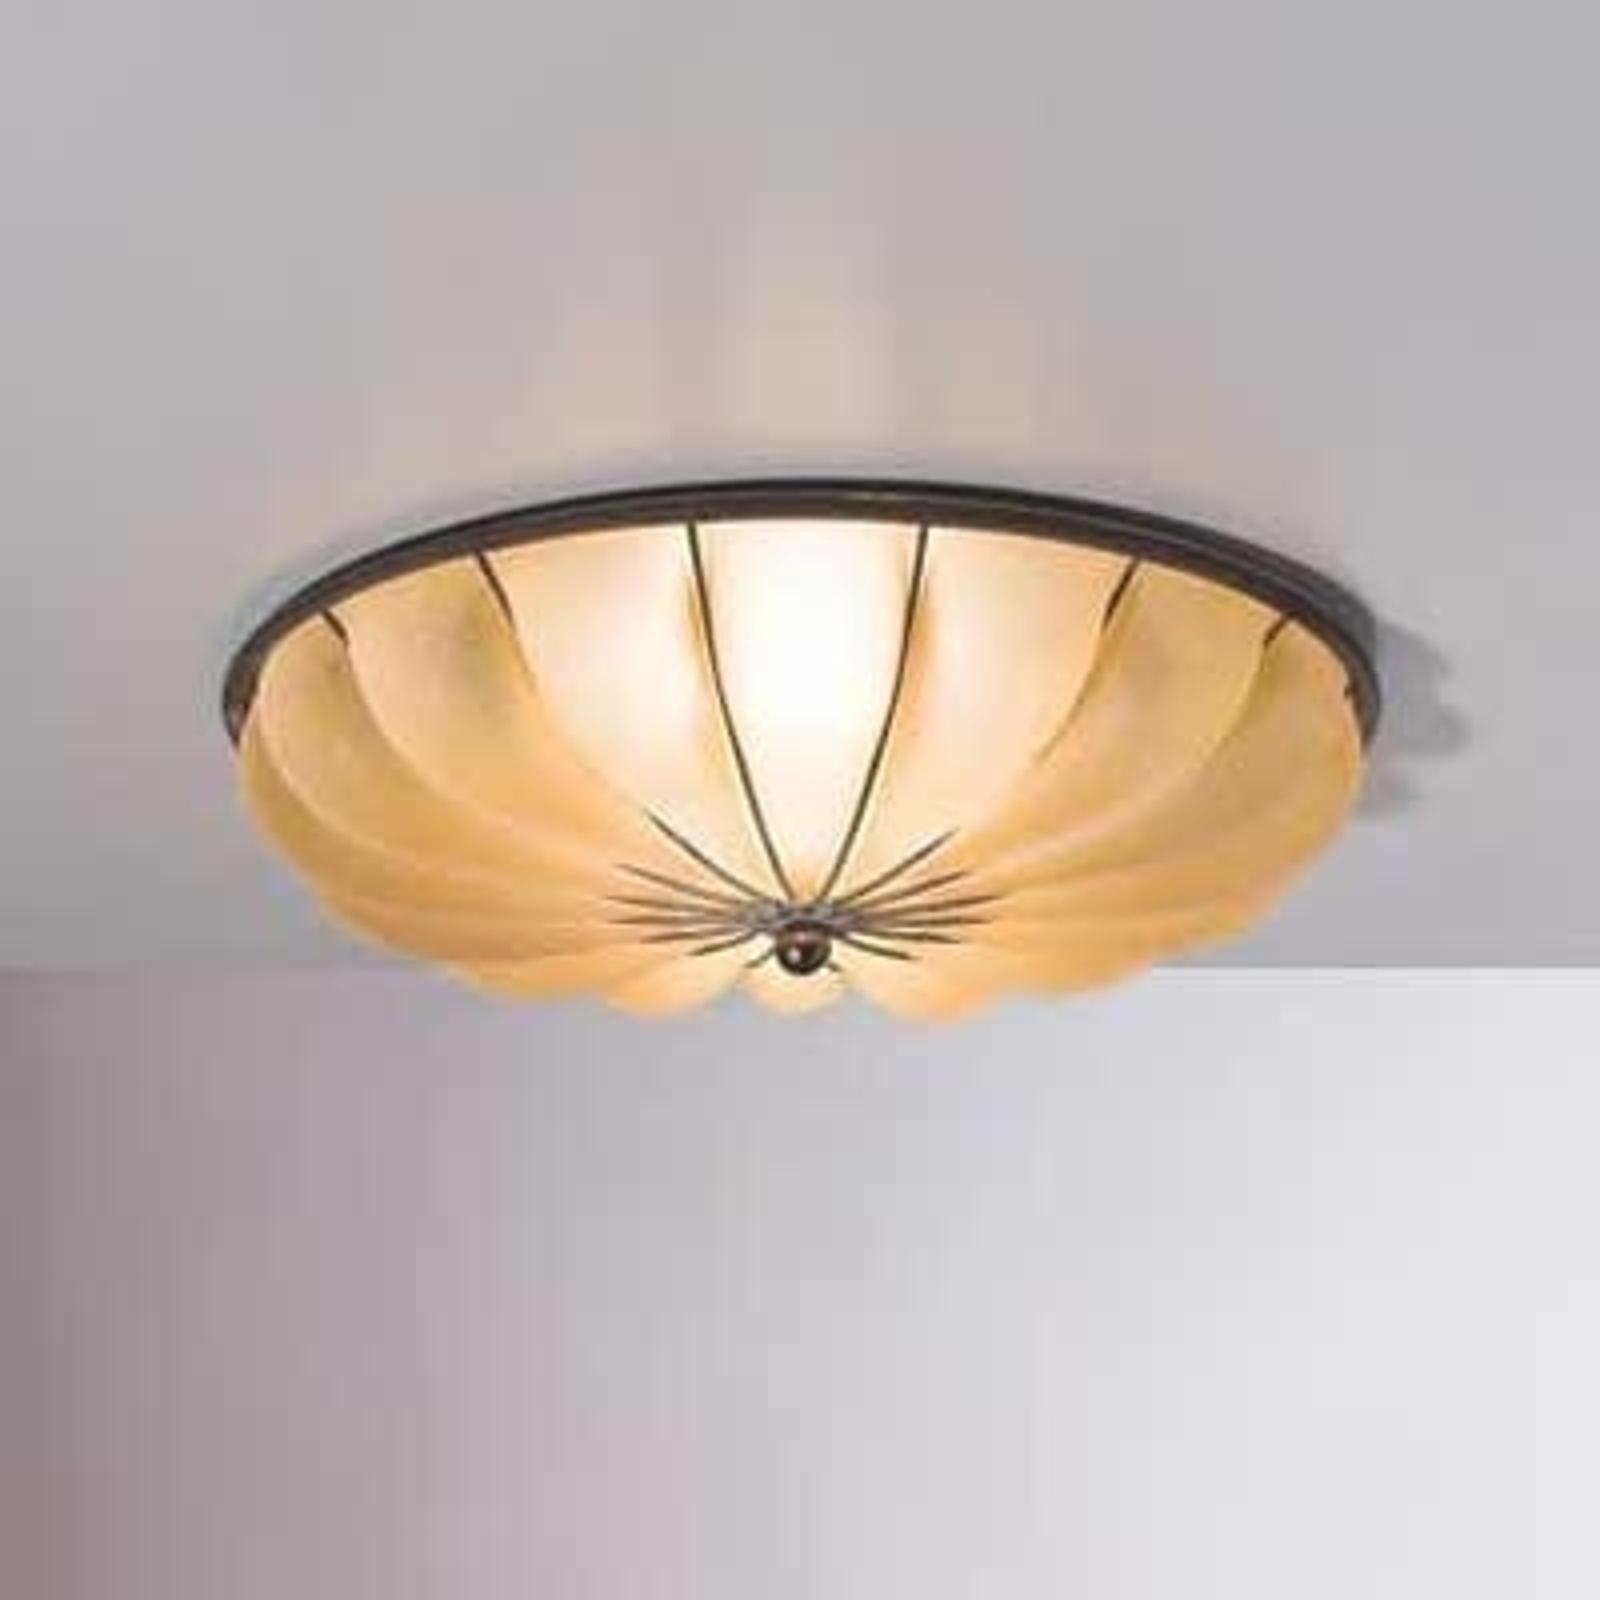 Halfronde plafondlamp RAGGIO, 33 cm